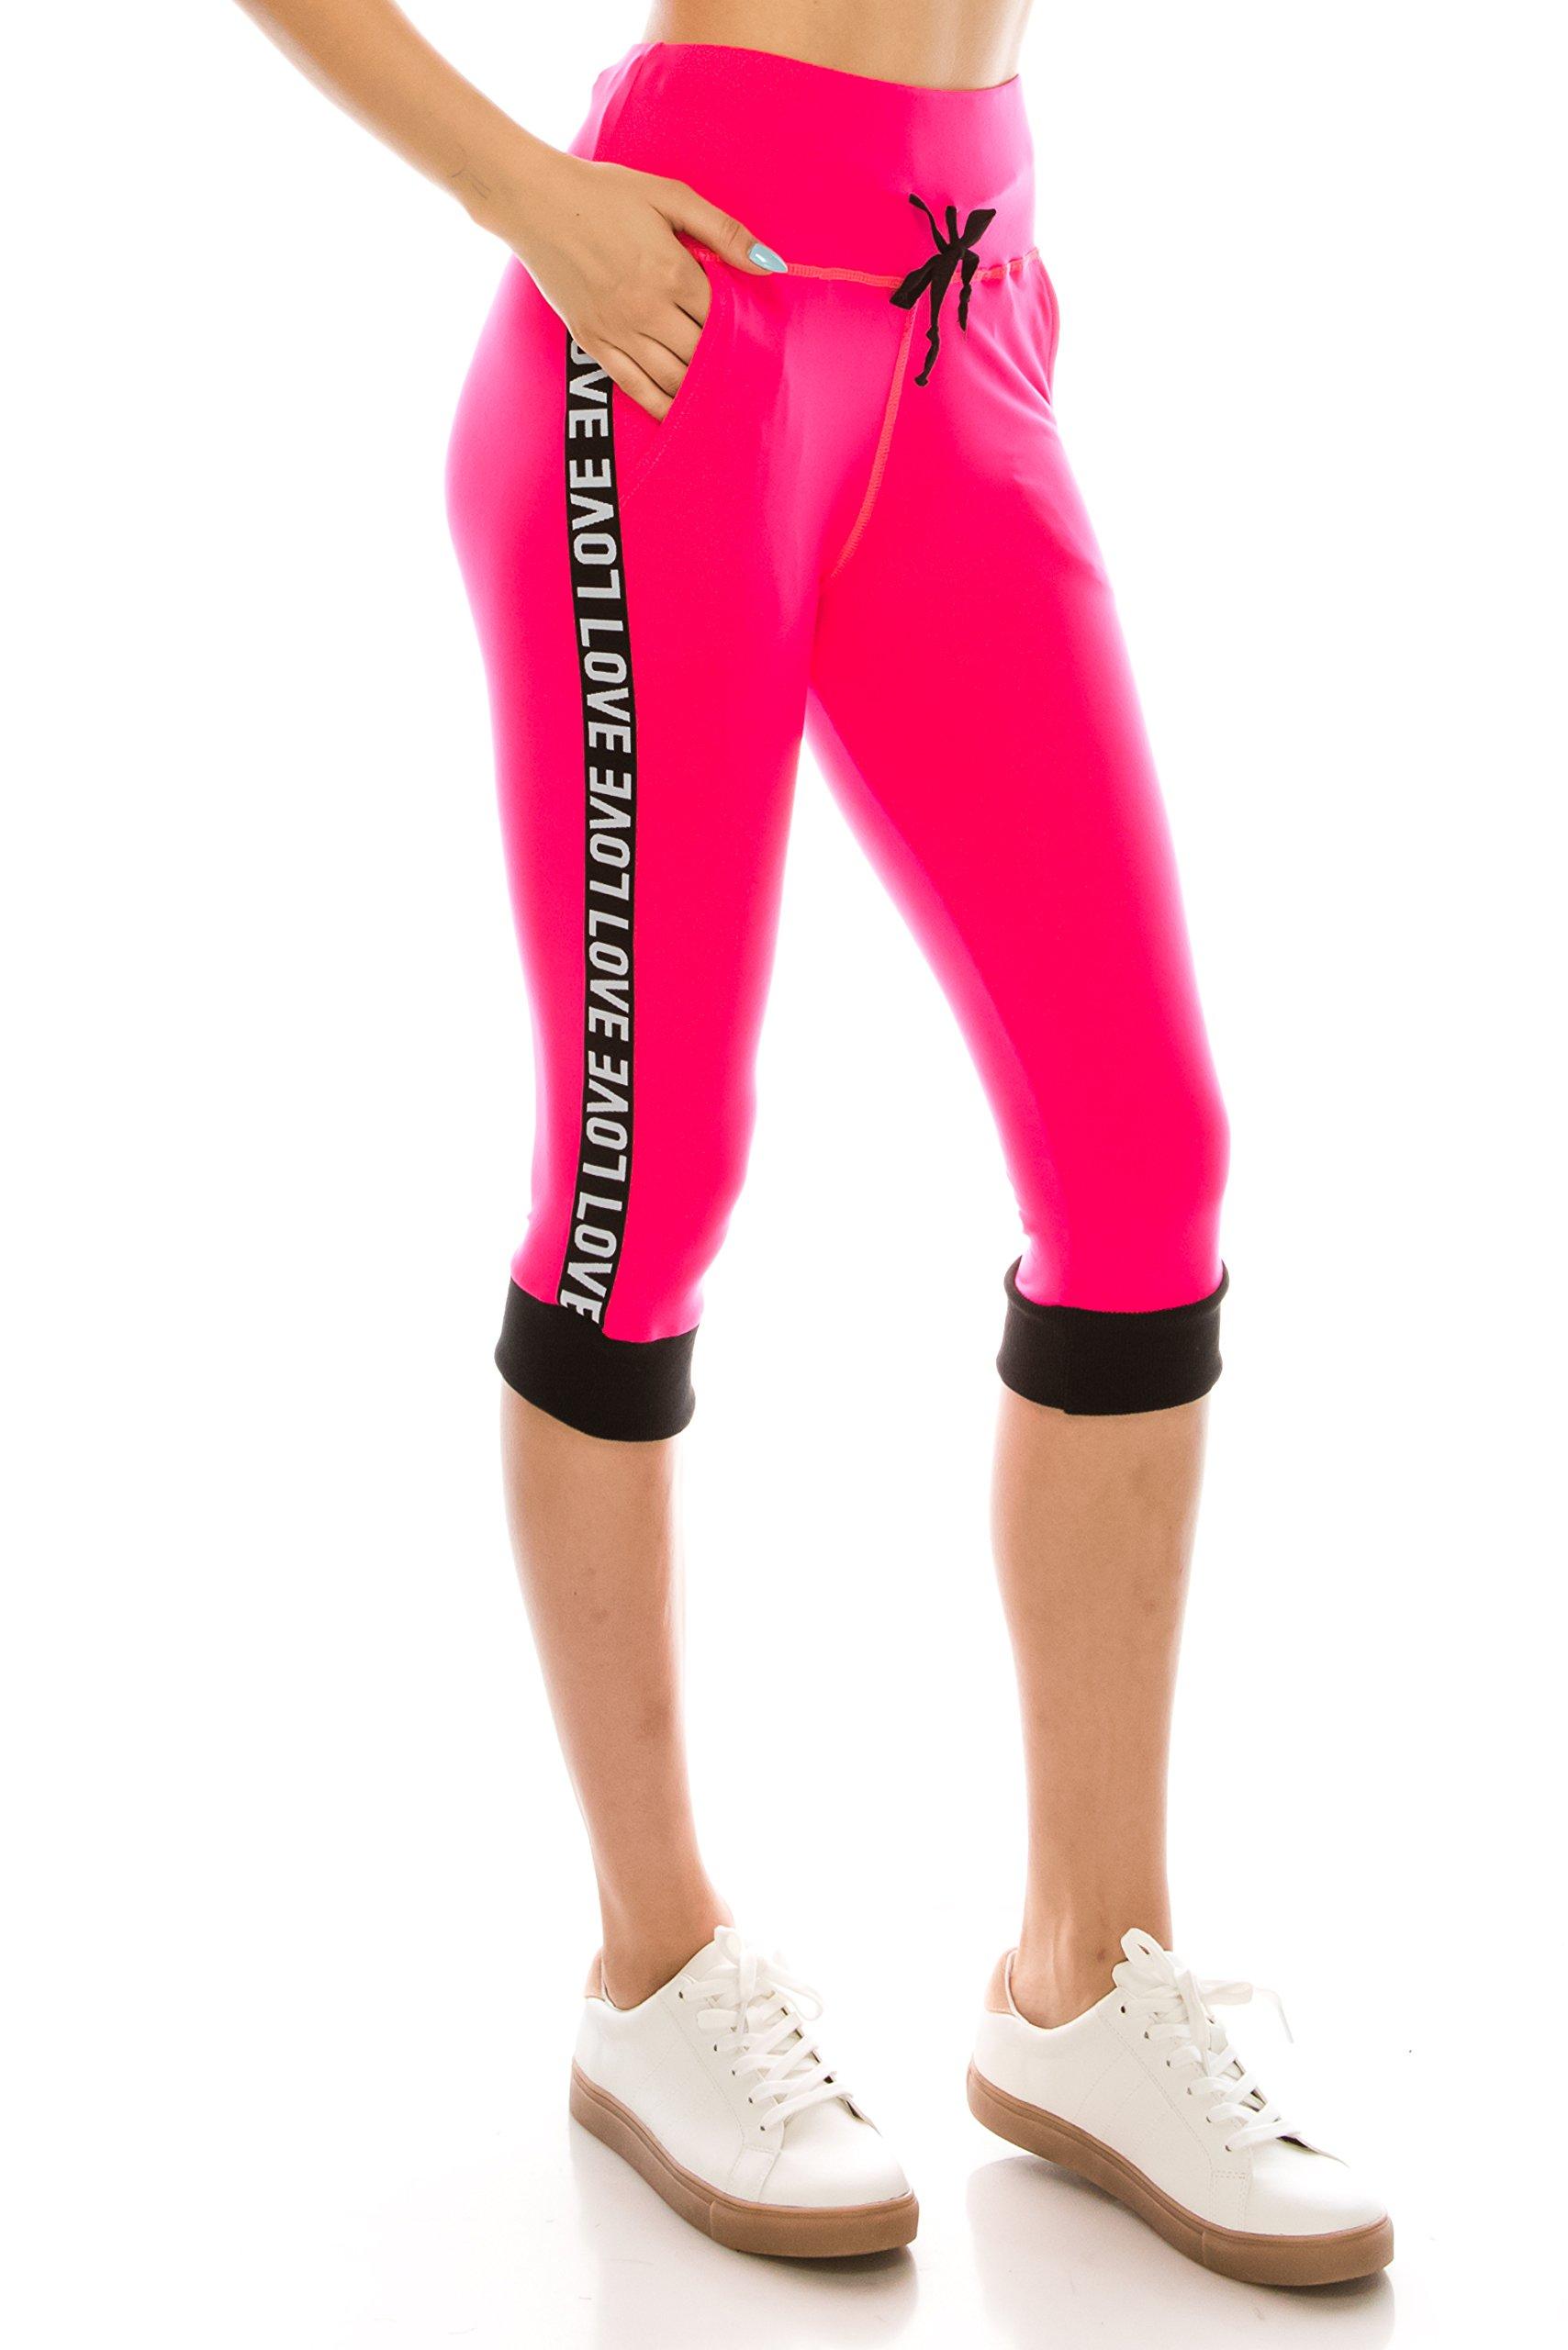 ALWAYS Women Drawstrings Jogger Sweatpants - Skinny Fit Premium Soft Stretch High-Waisted Capri Pockets Track Pants Neon Pink S/M